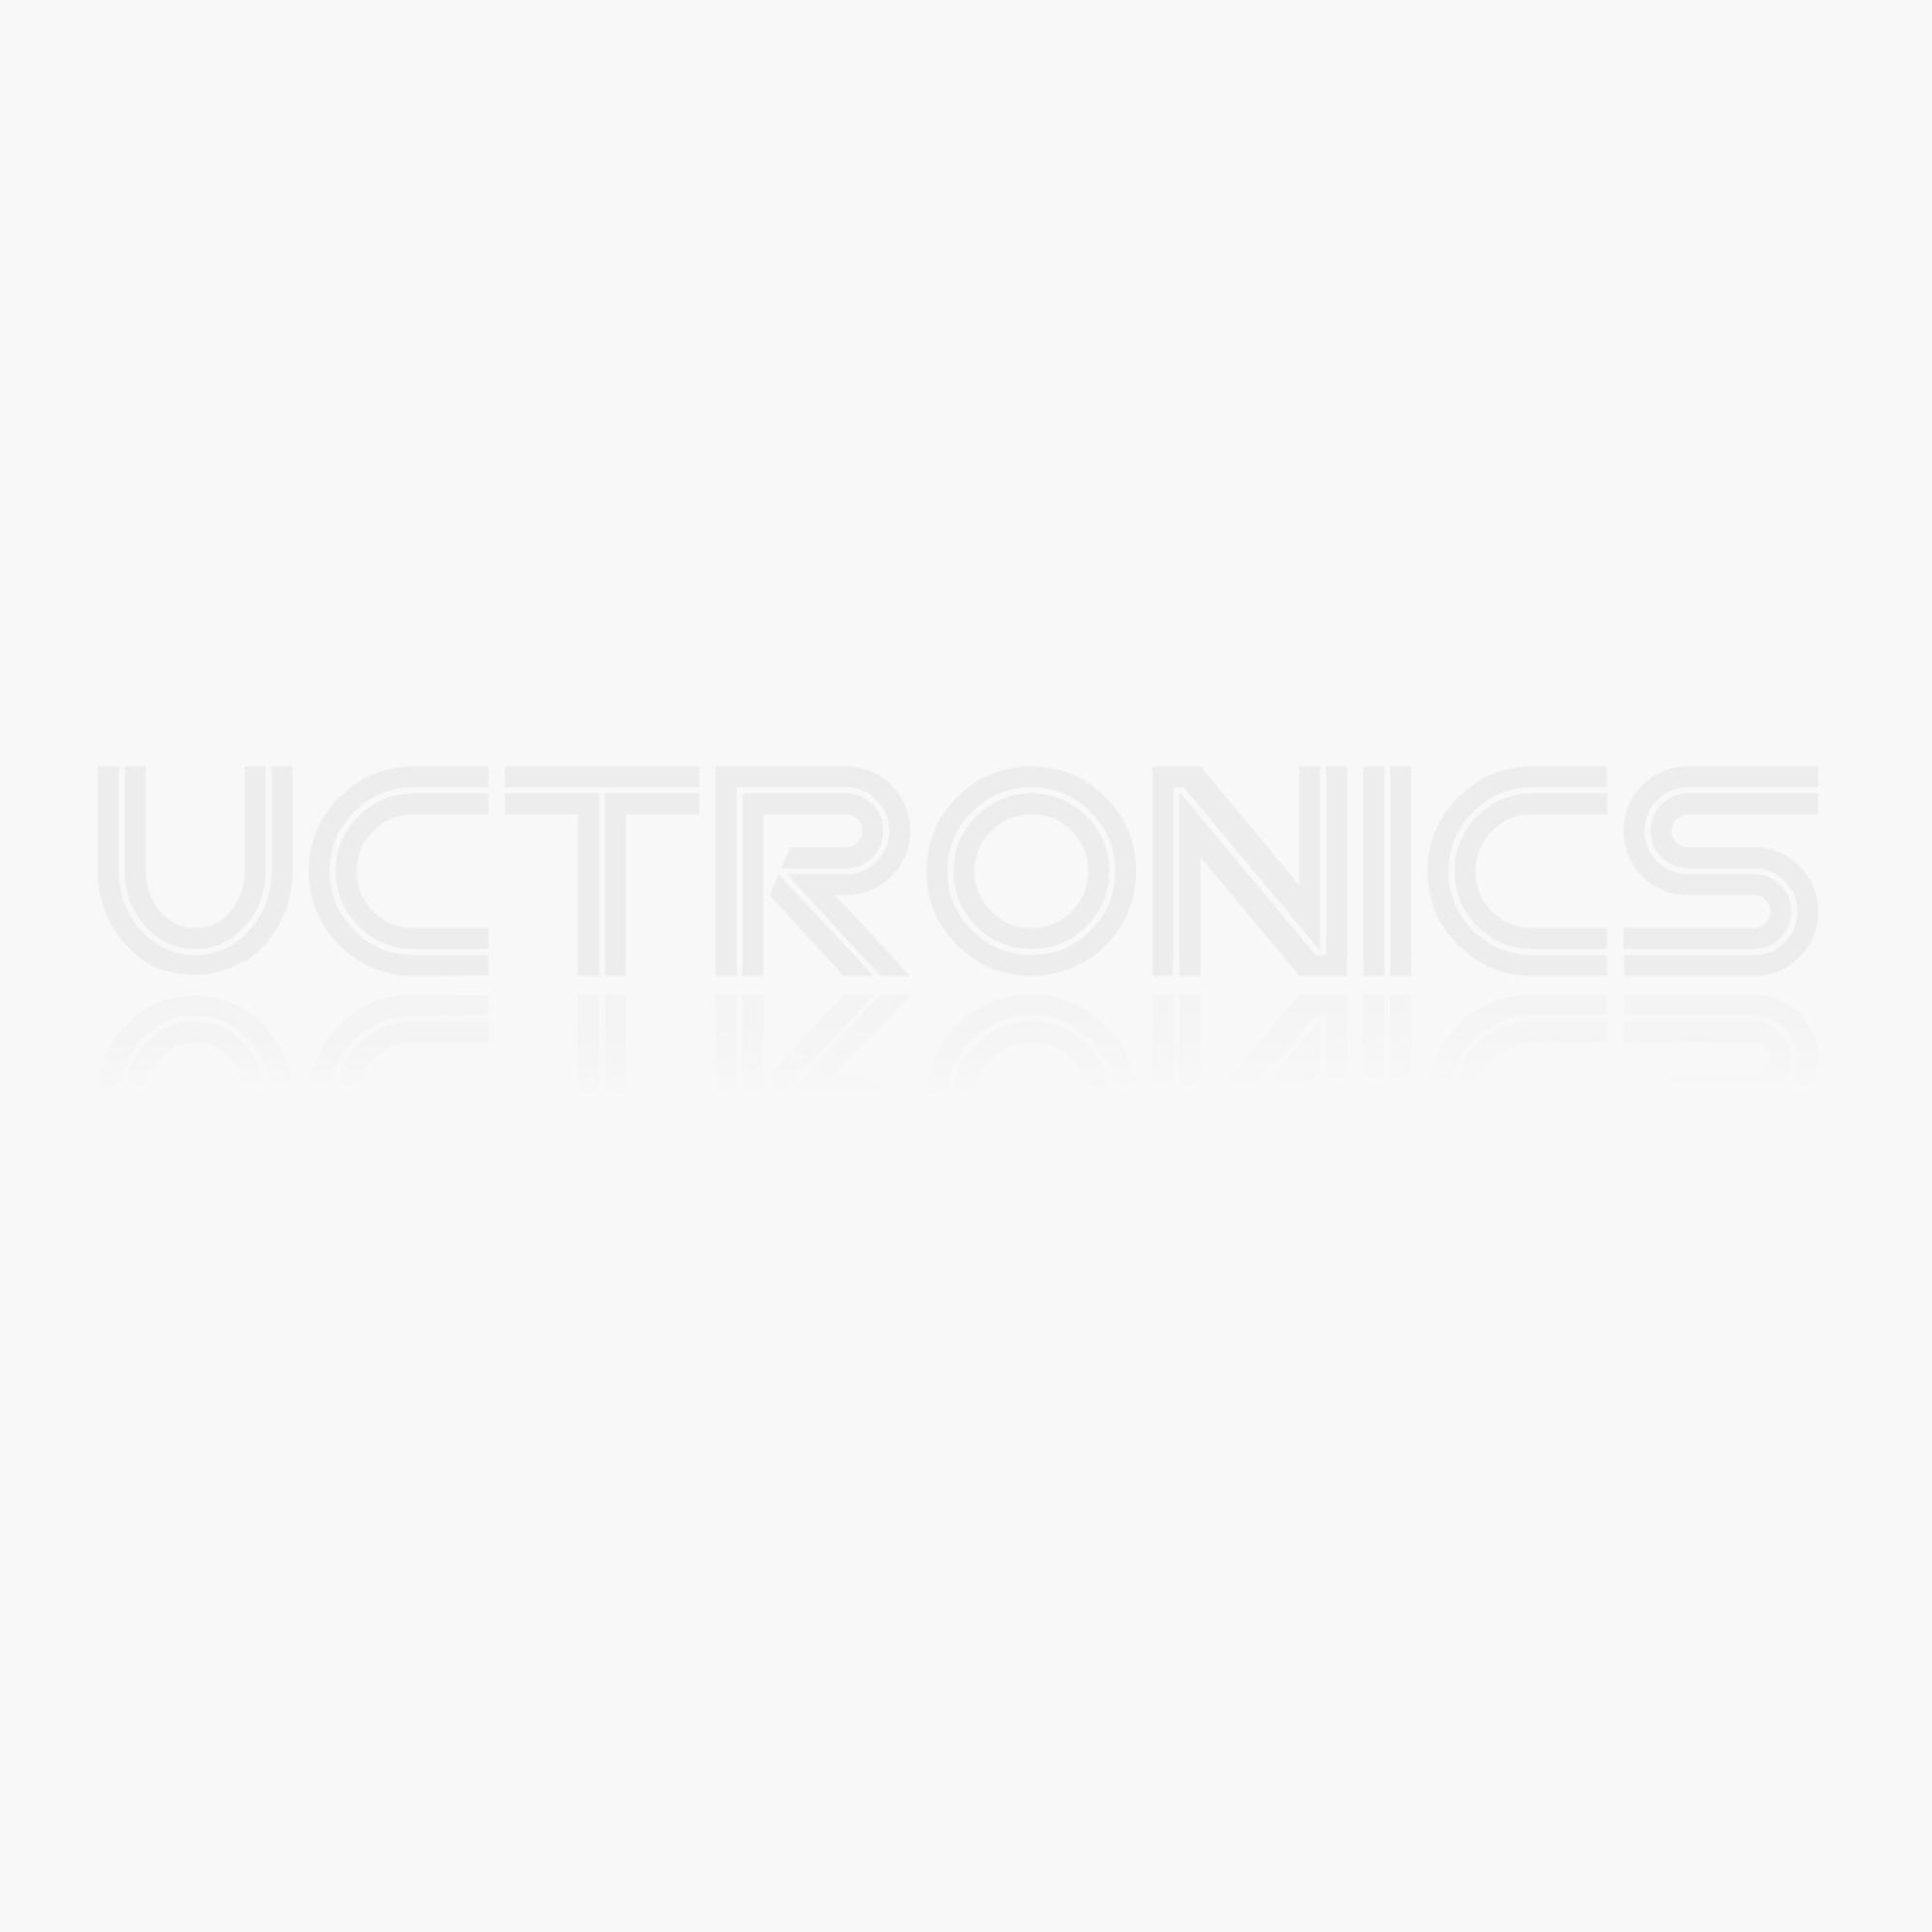 DM55-1 AC100-300V LCD Digital Volt Meter Voltmeter Flat Plug American Plug